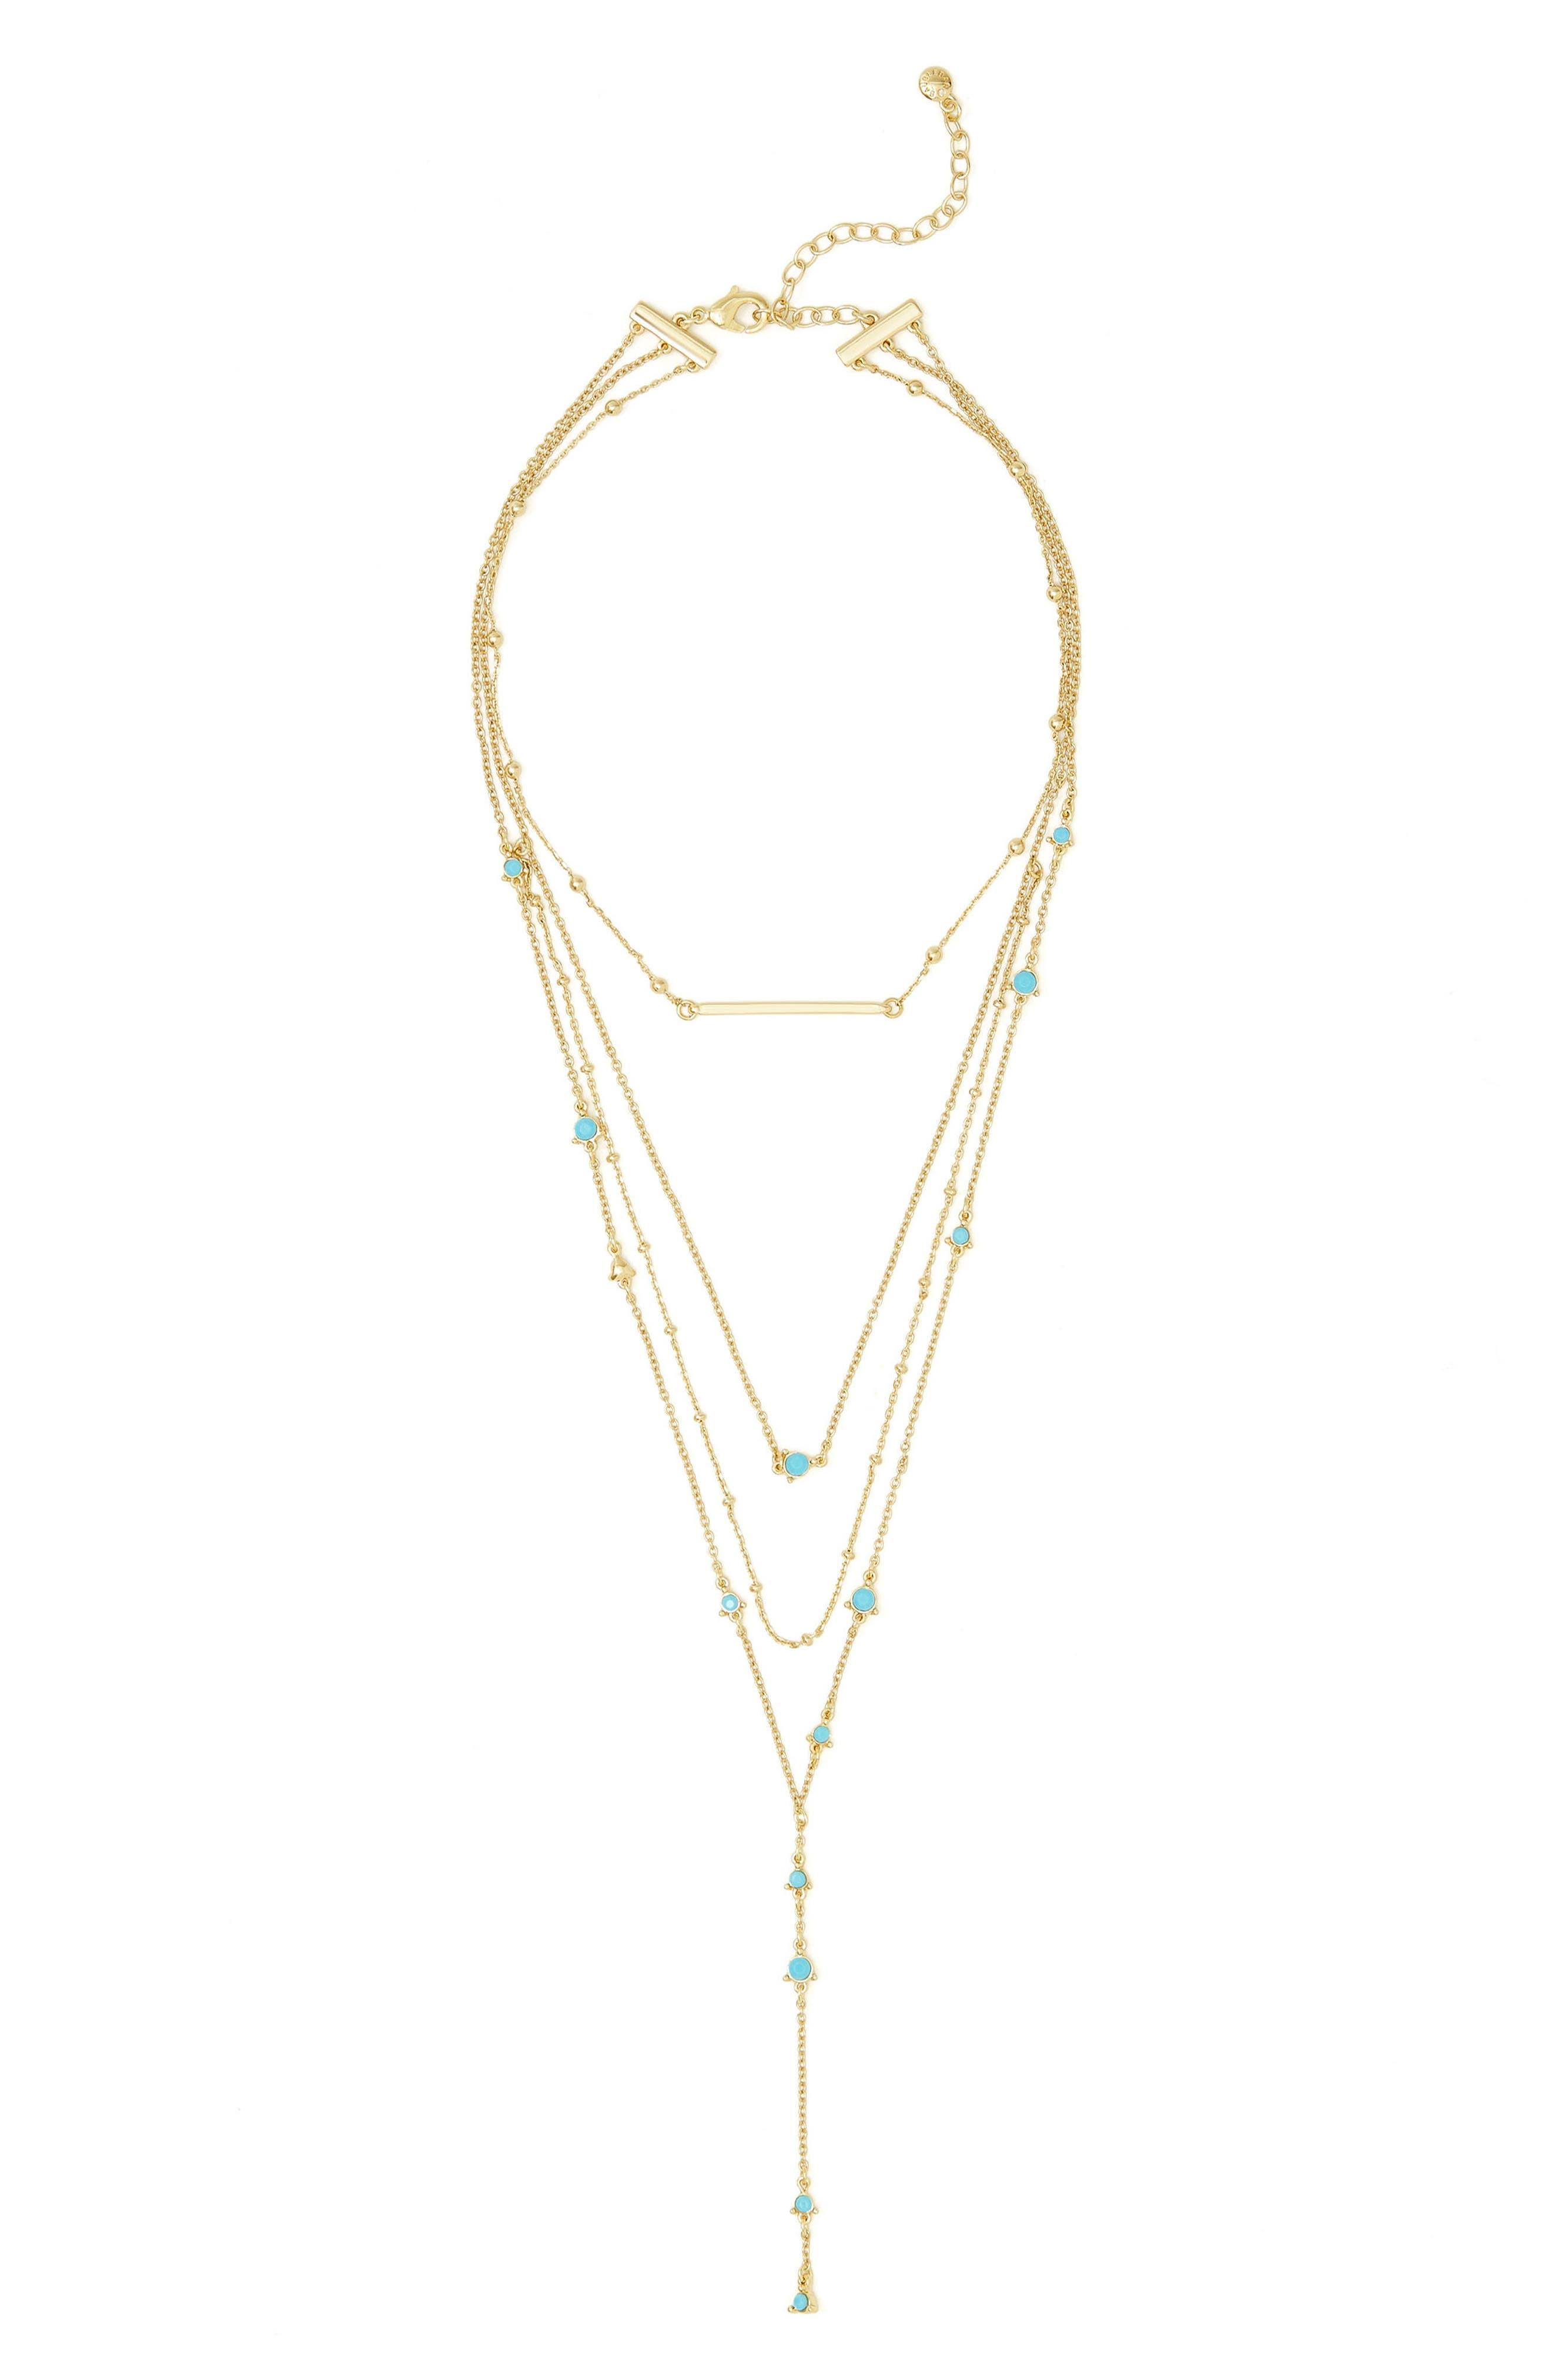 BaubleBar Harlow Layered Lariat Necklace